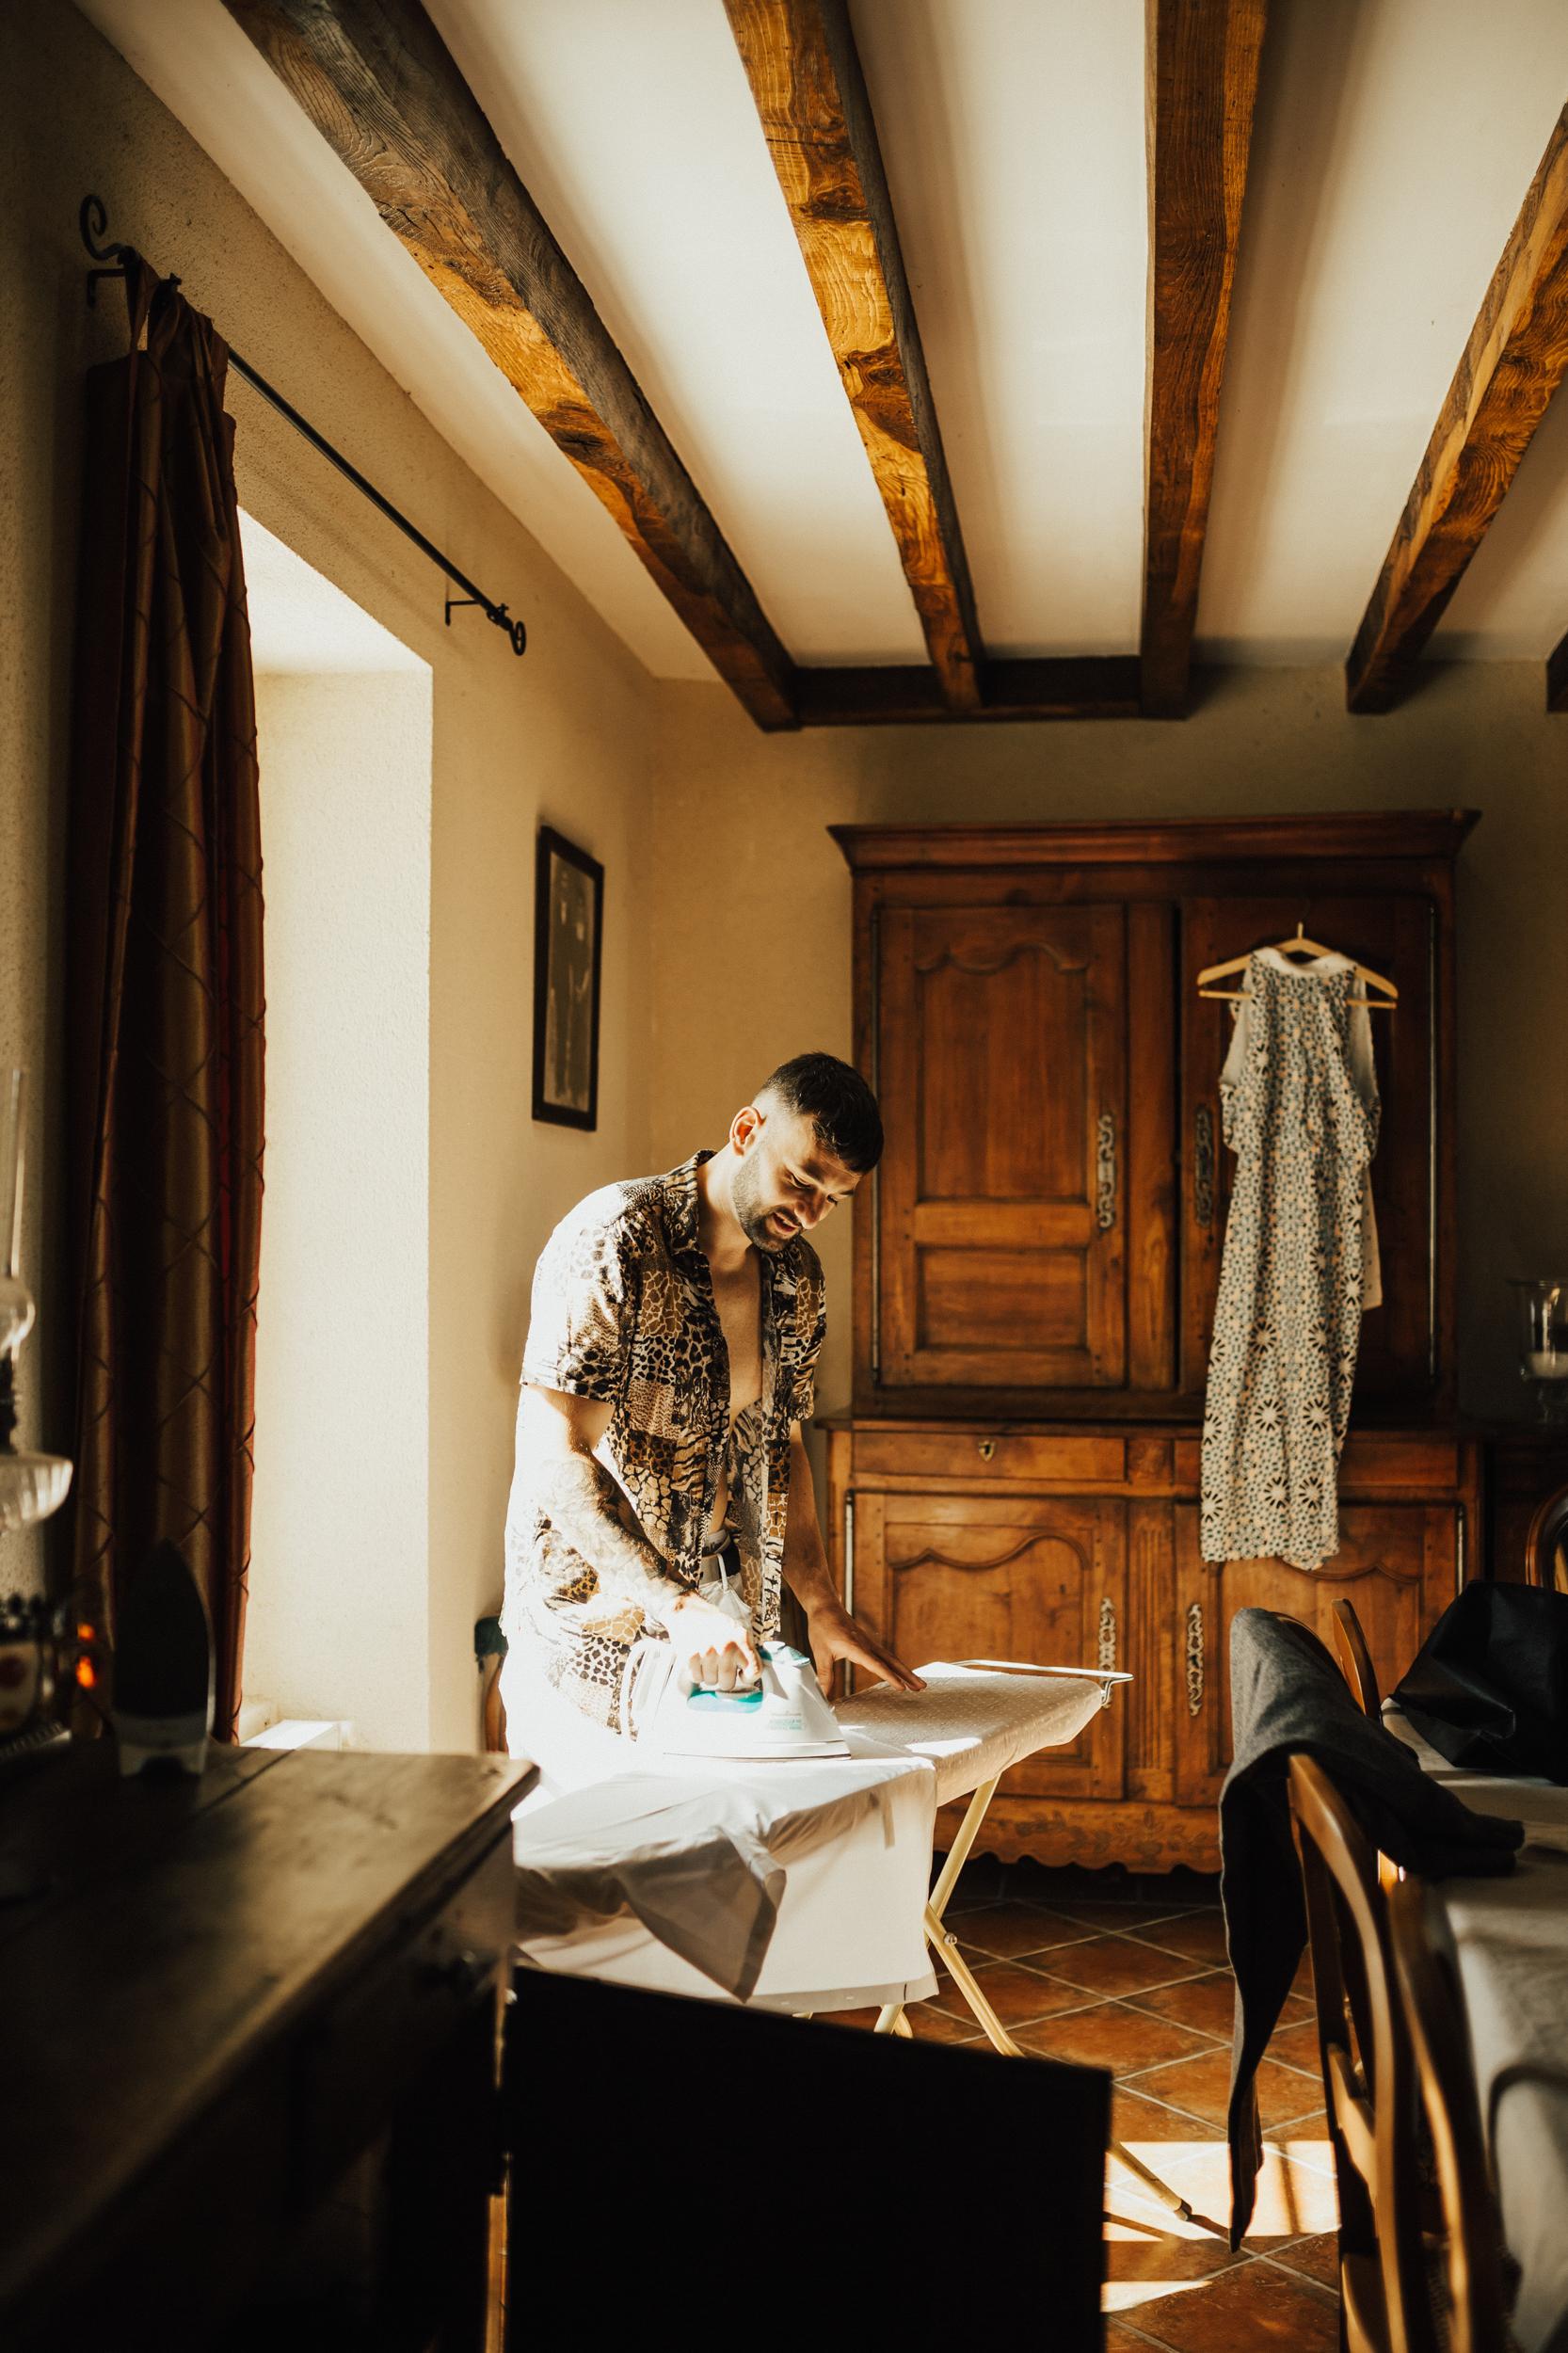 Amy-Zac-Destination-Wedding-France-Manoir-Foulquetiere-Darina-Stoda-Photography-9.jpg